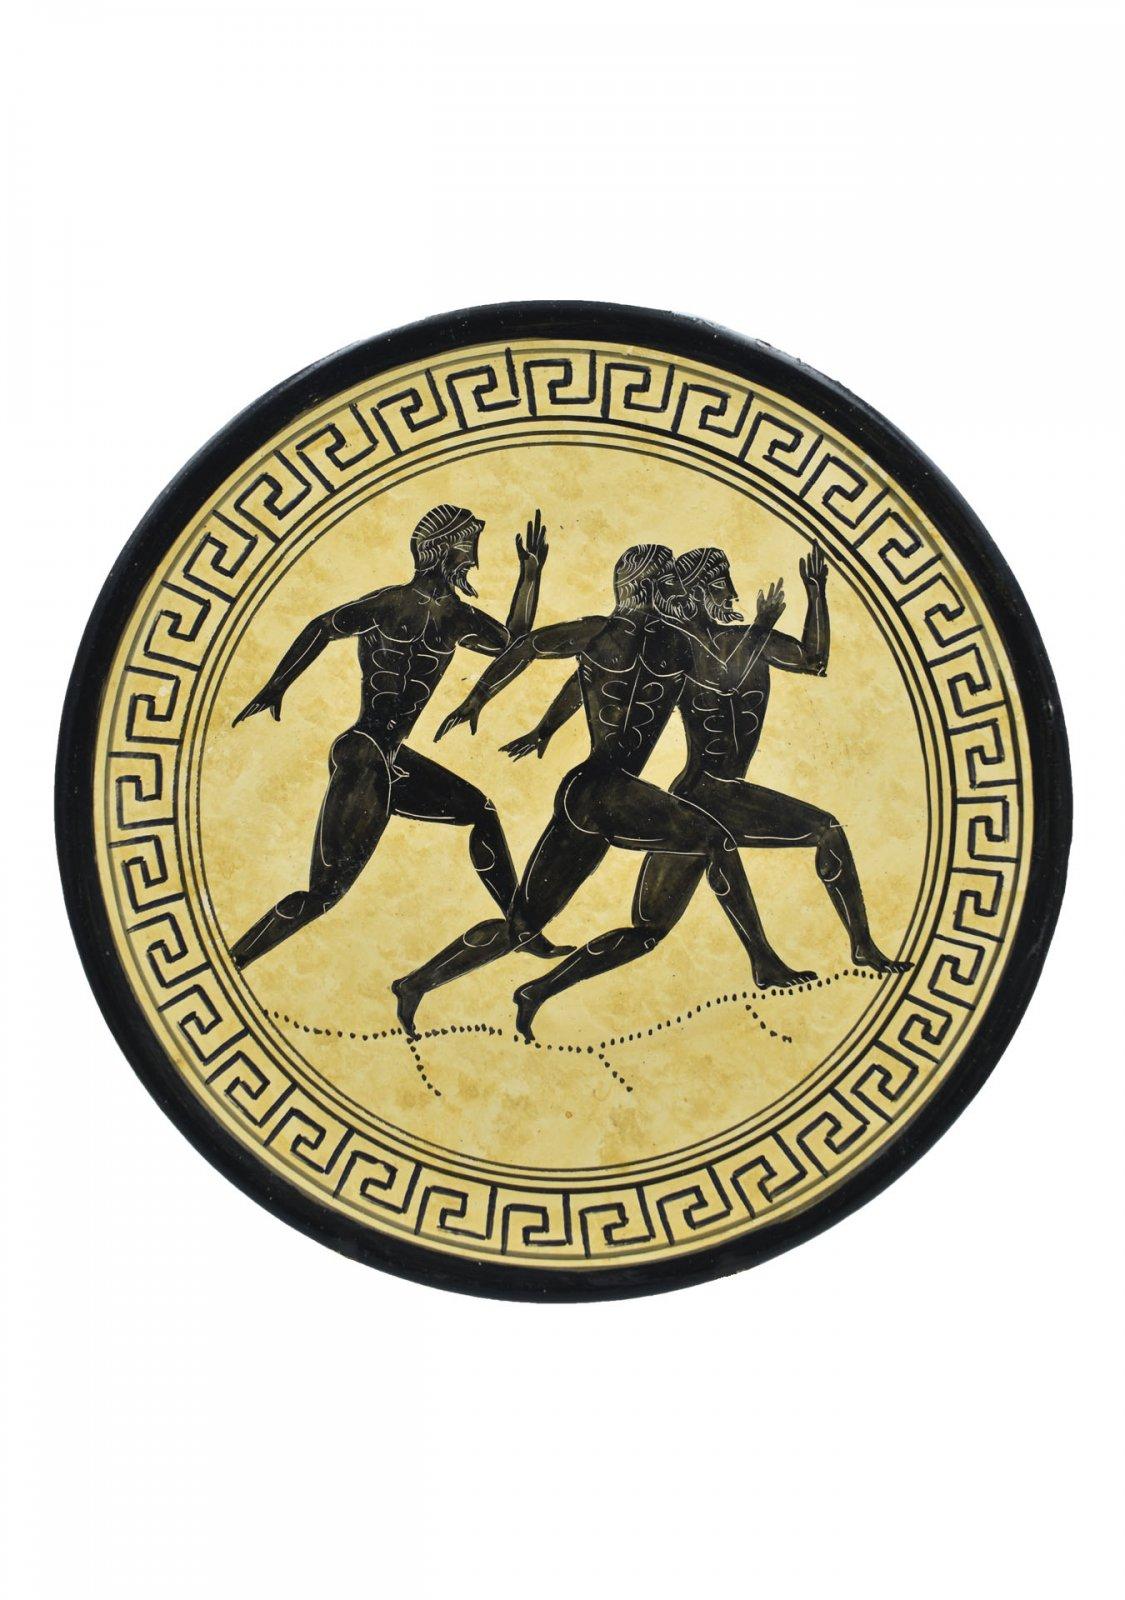 Greek ceramic plate depicting Marathon Runners